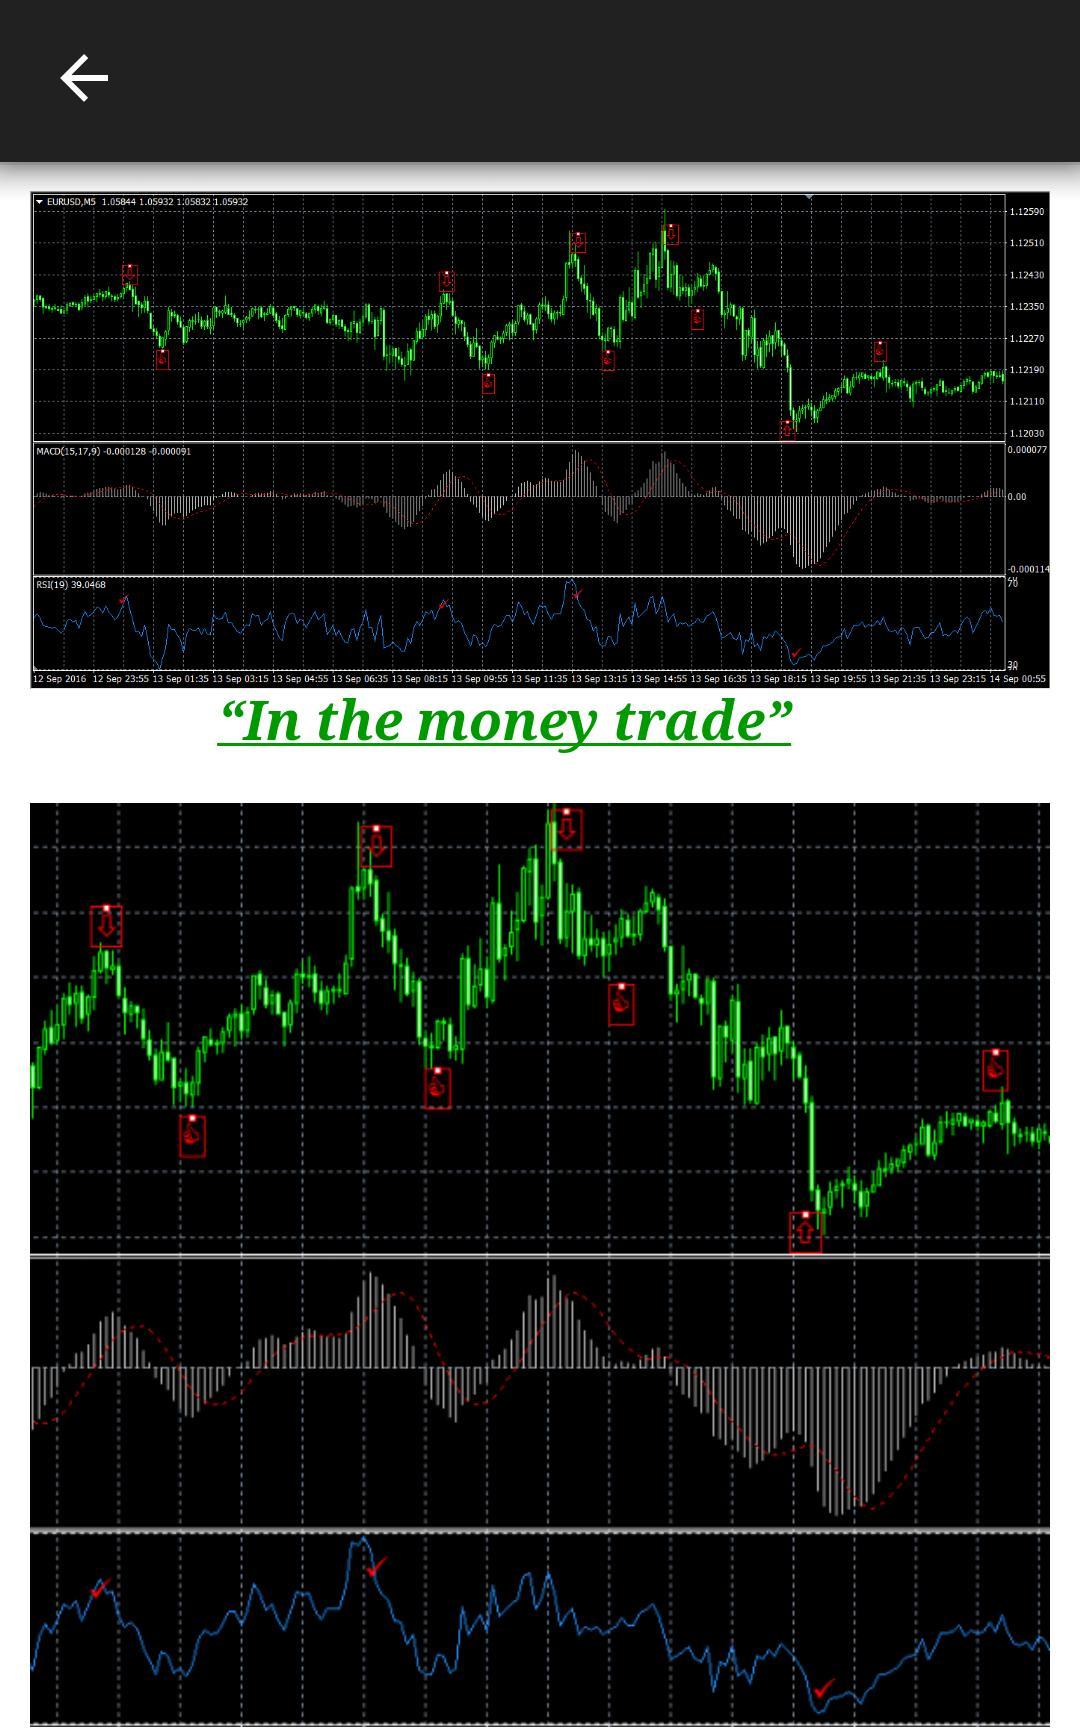 Trading binary options strategies and tactics download firefox bra betting sidorme